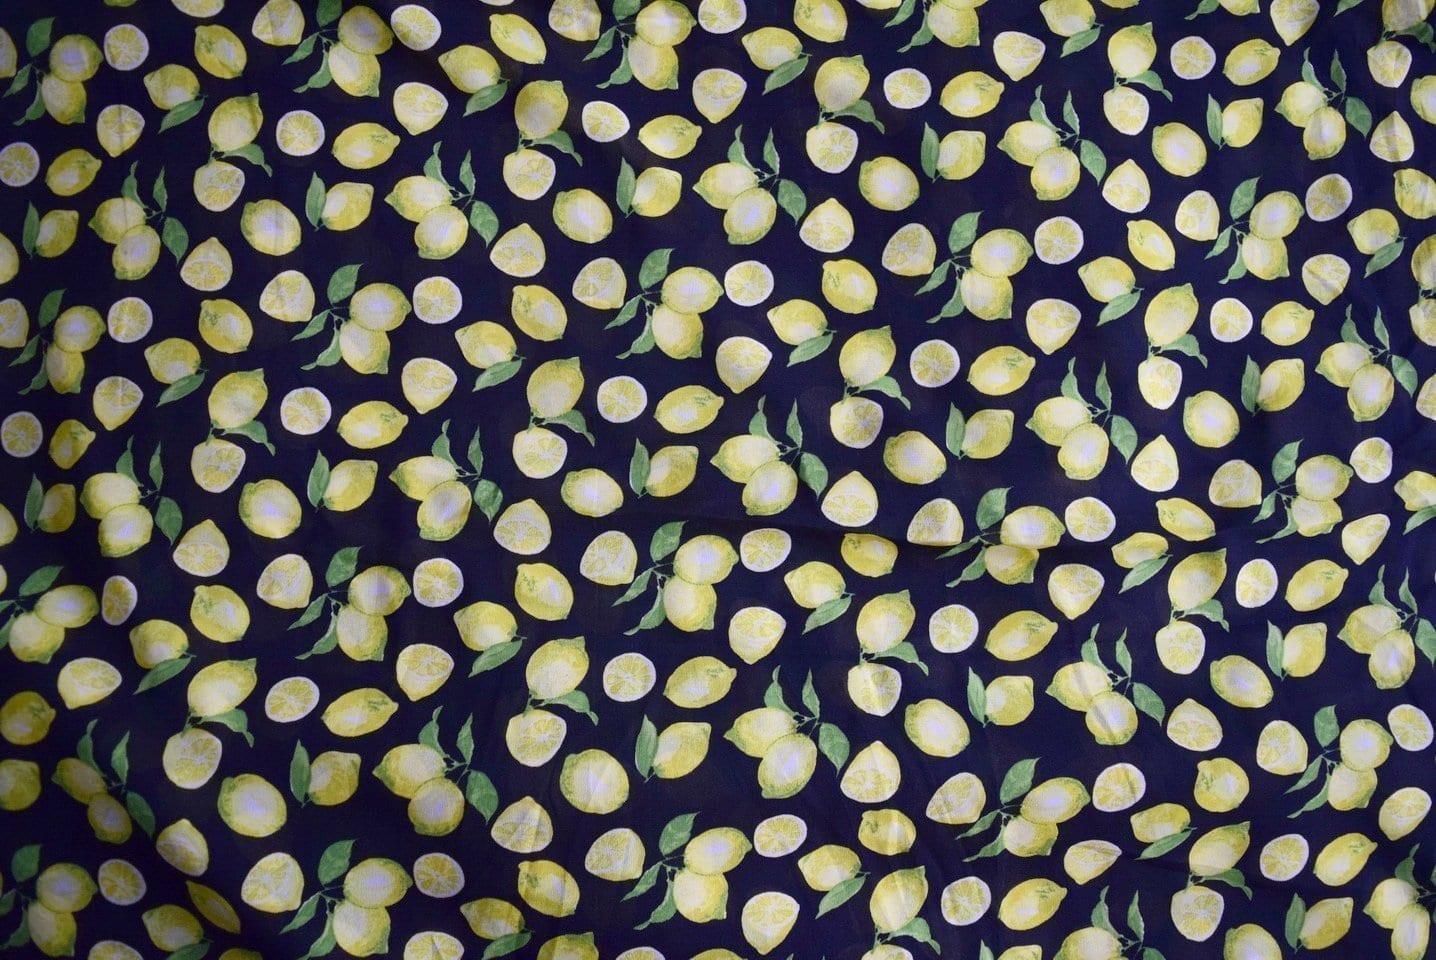 GEORGETTE PRINTED fabric for Kurti, Saree, Salwar, Dupatta GF031 2